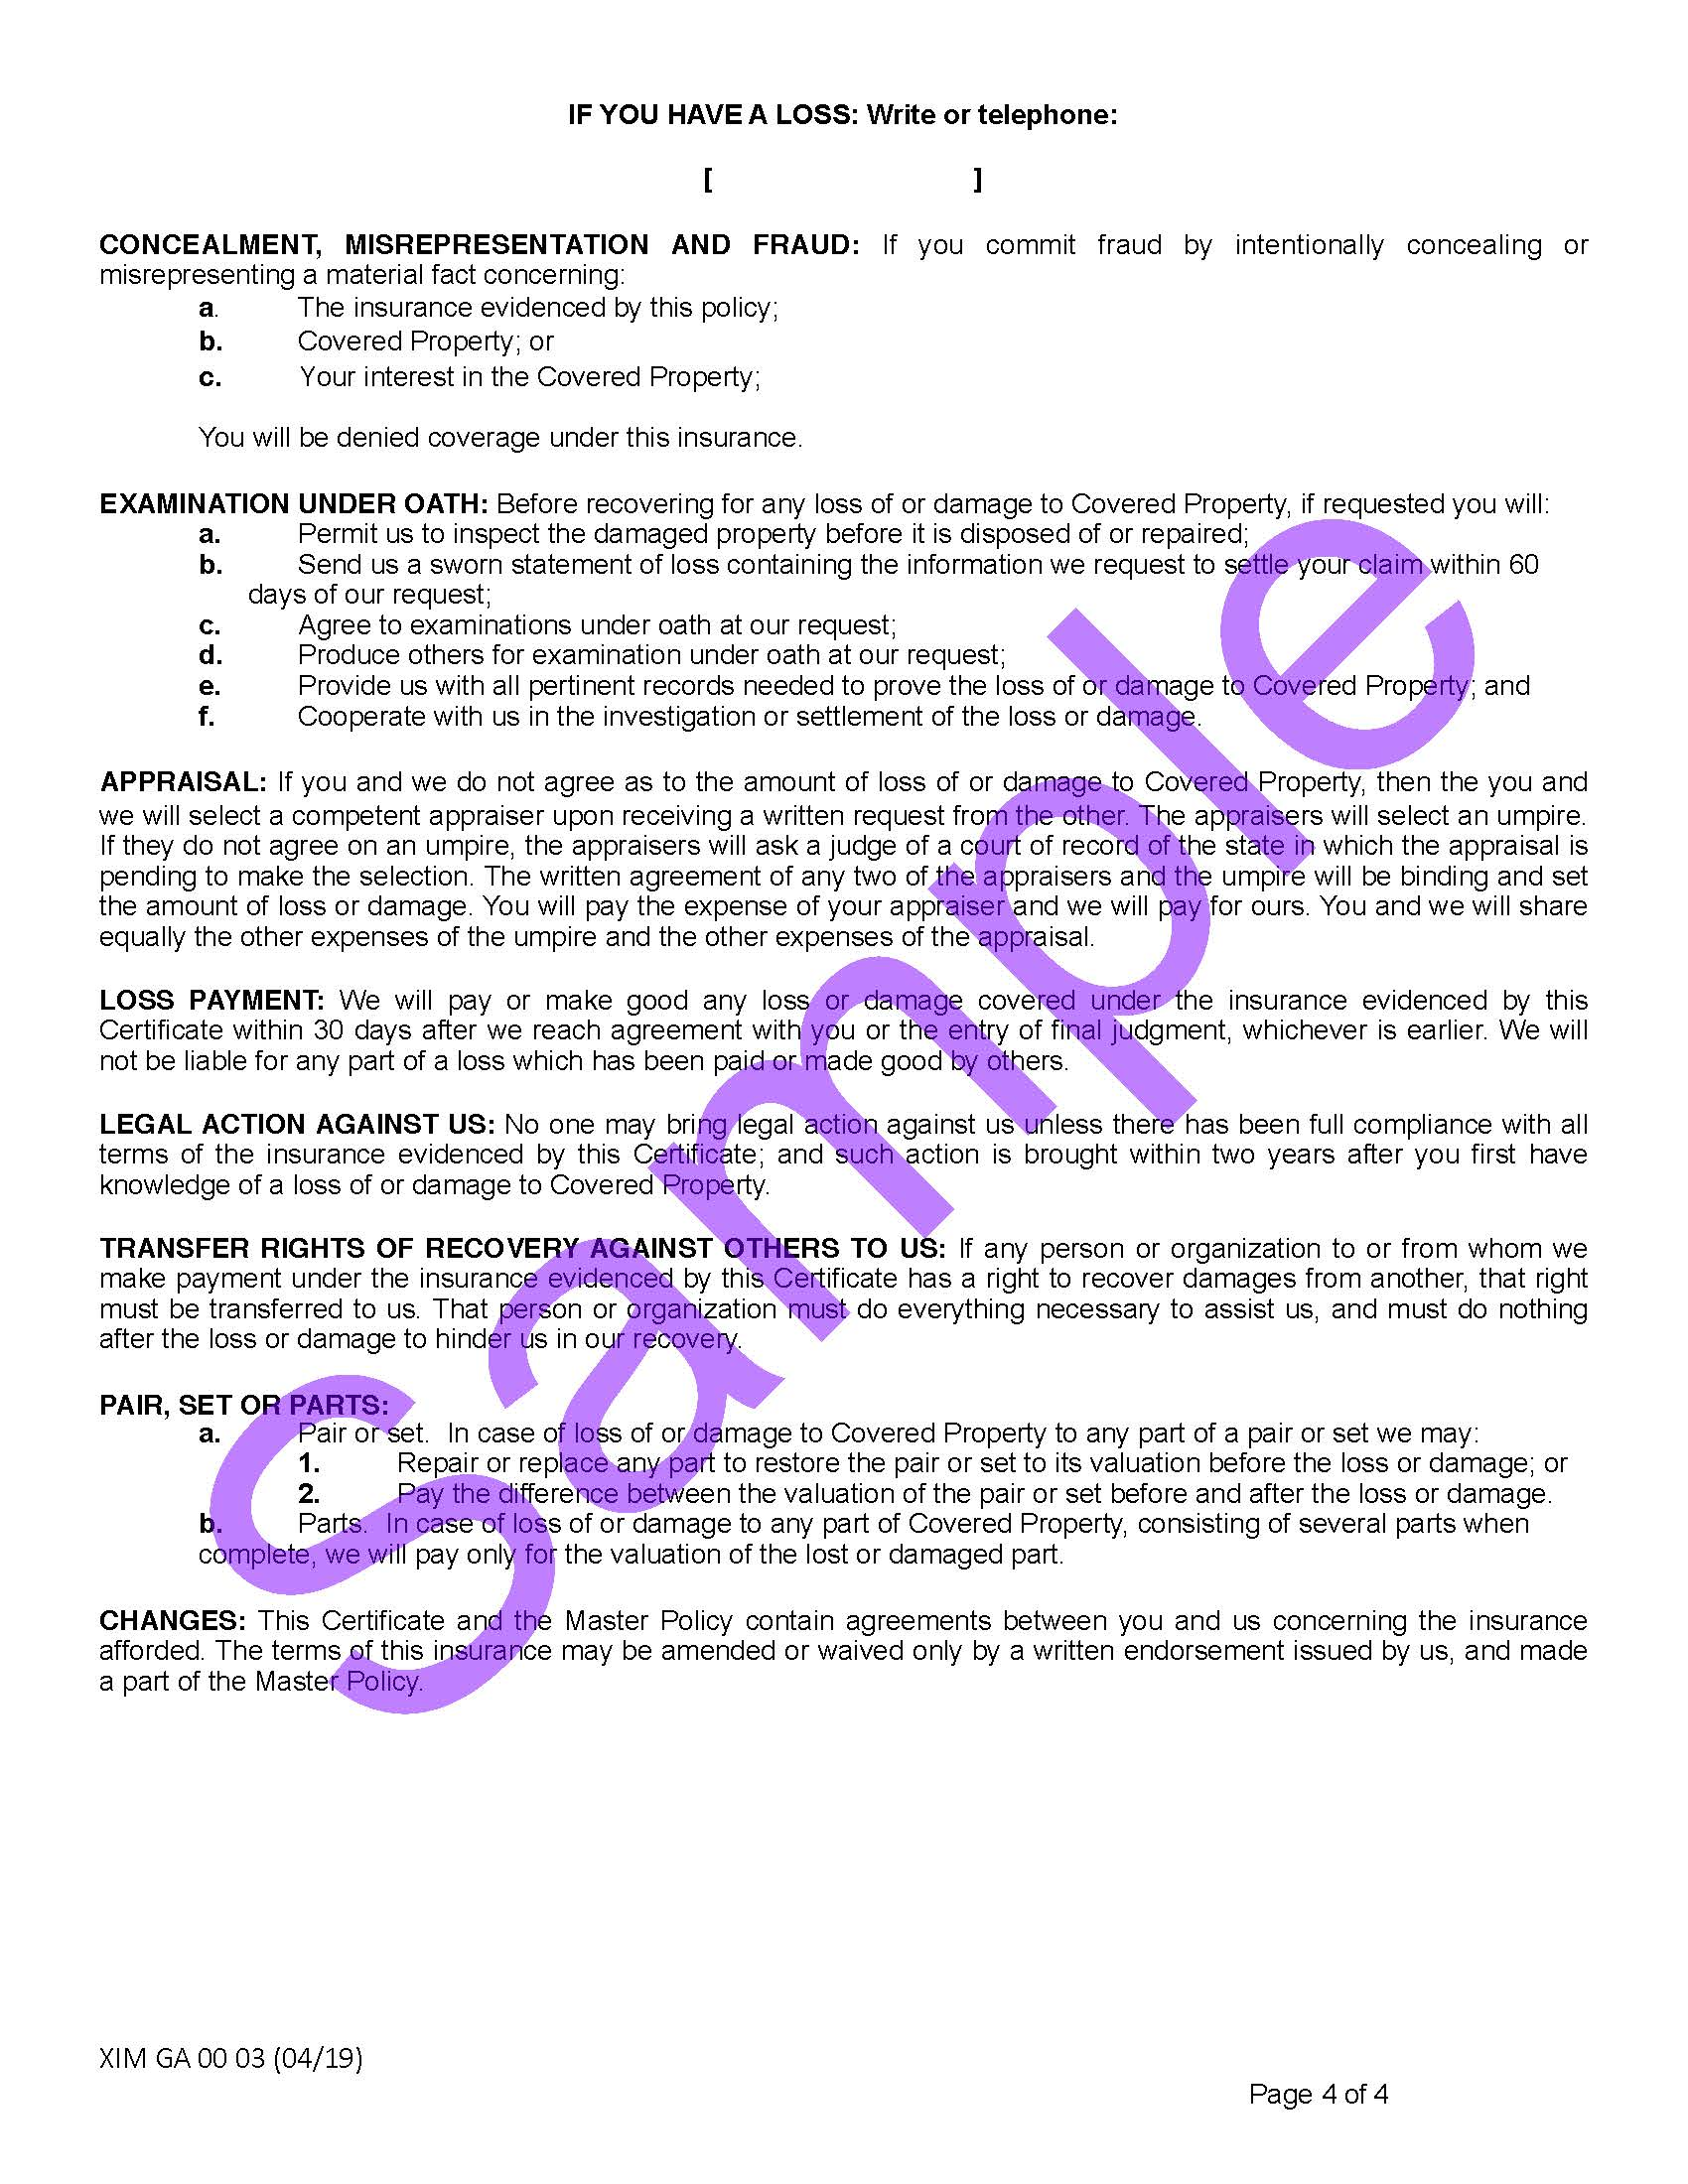 XIM GA 00 03 04 19 Georgia Certificate of Storage InsuranceSample_Page_4.jpg